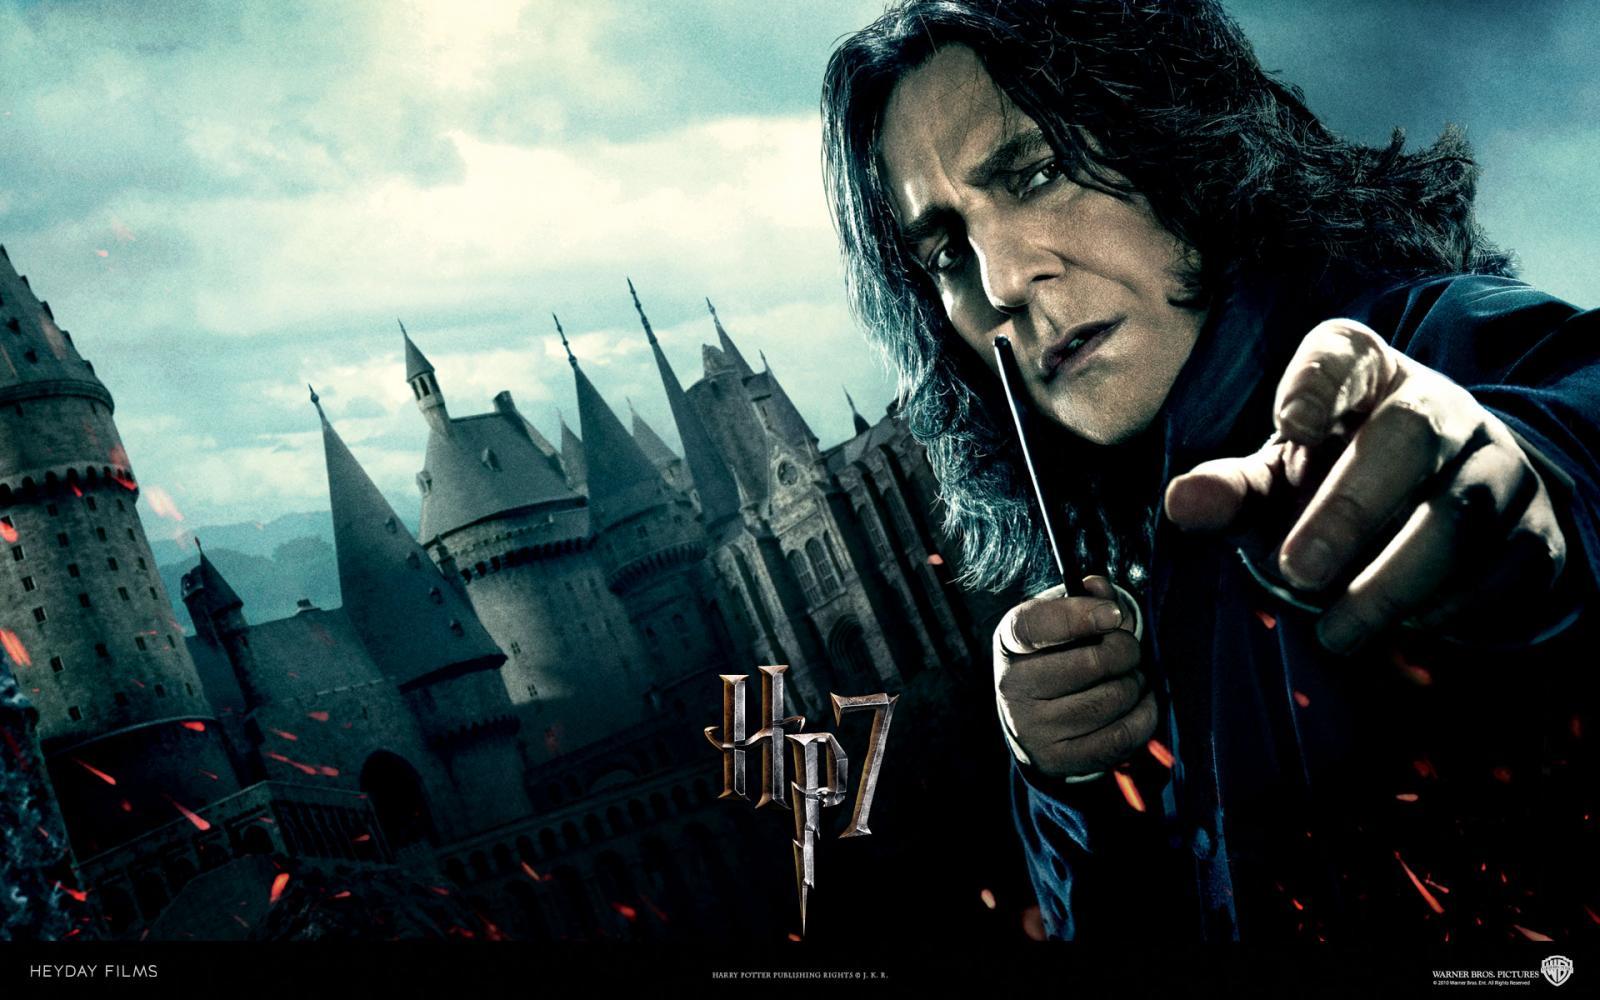 Wallpaper Harry Potter Snape